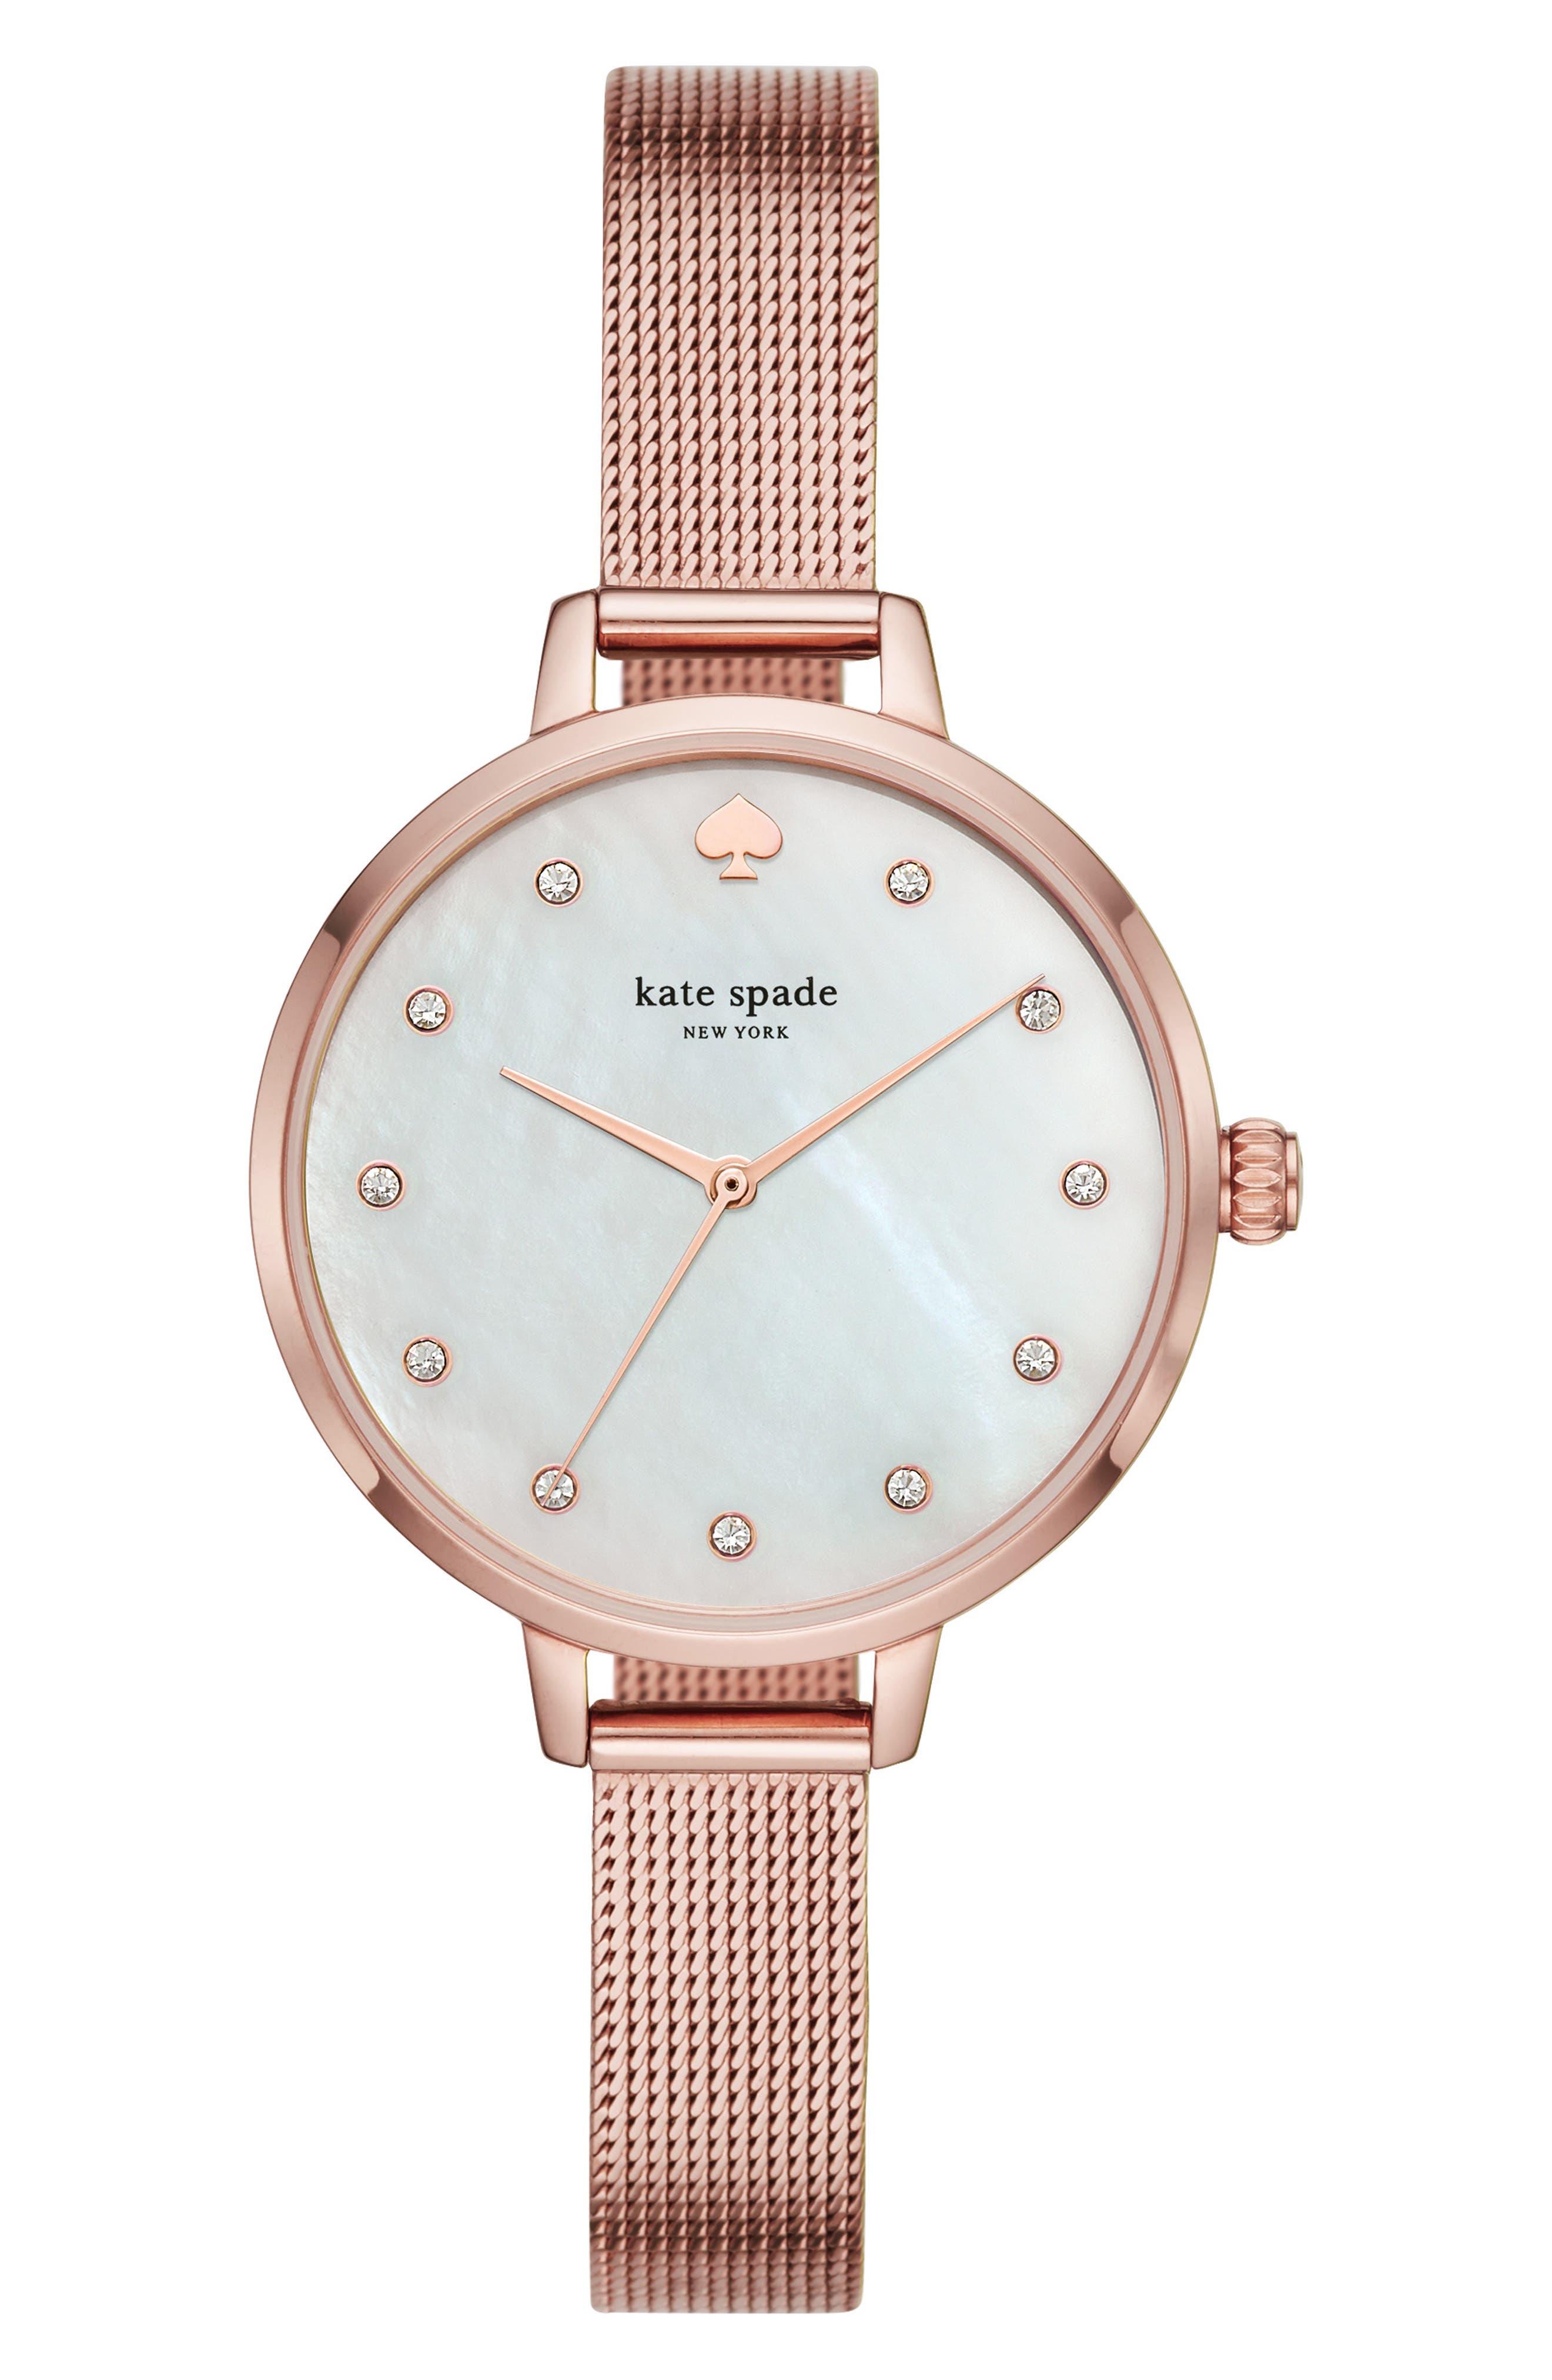 KATE SPADE NEW YORK metro mesh bracelet watch, 34mm, Main, color, ROSE GOLD/ MOP/ ROSE GOLD